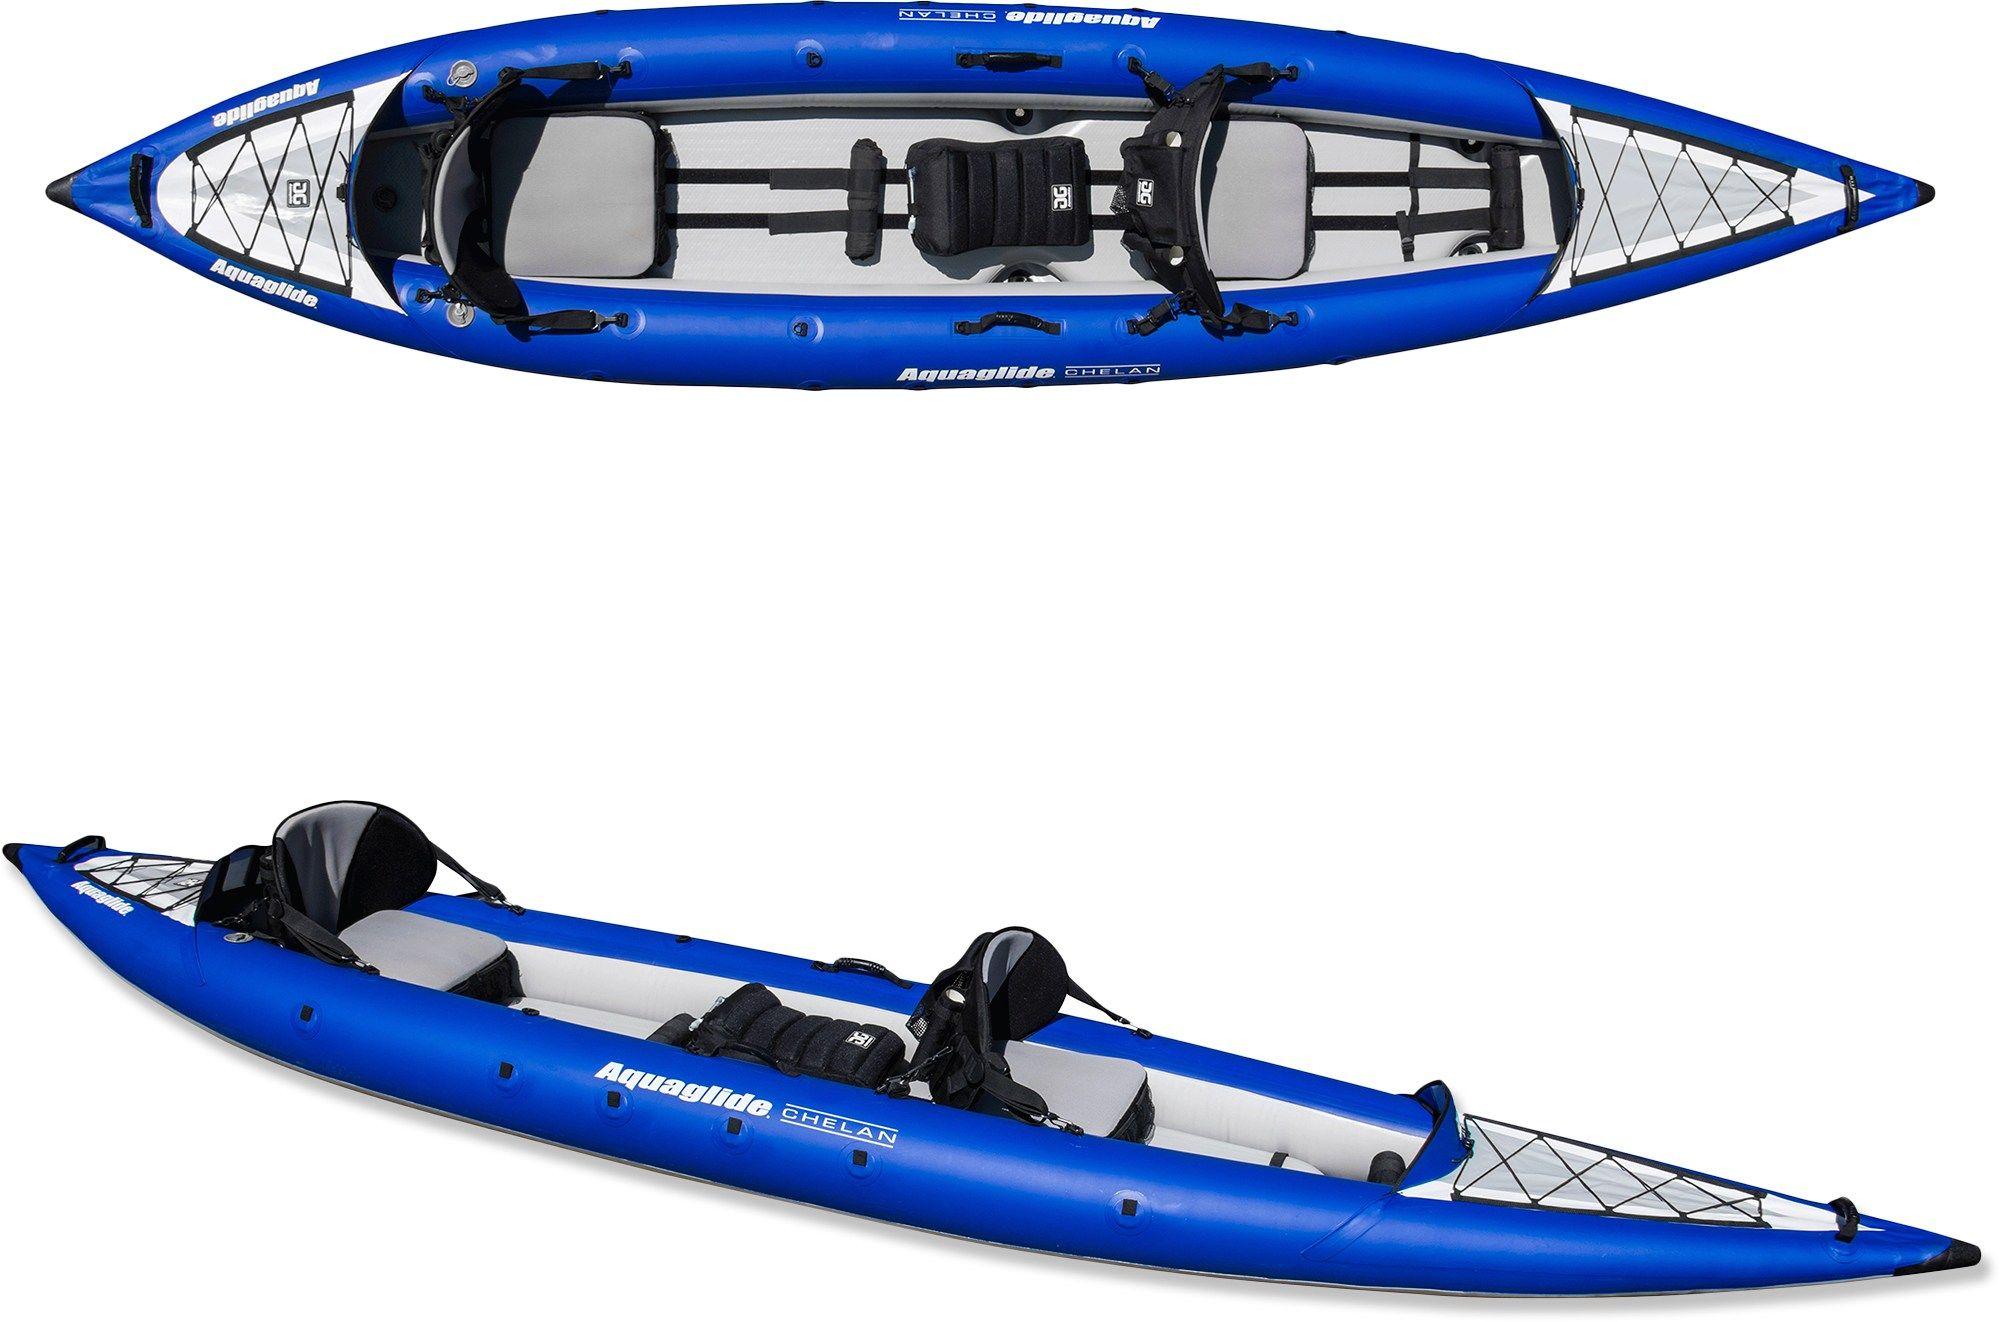 Chelan HB Tandem XL Inflatable Kayak | *Sporting Goods